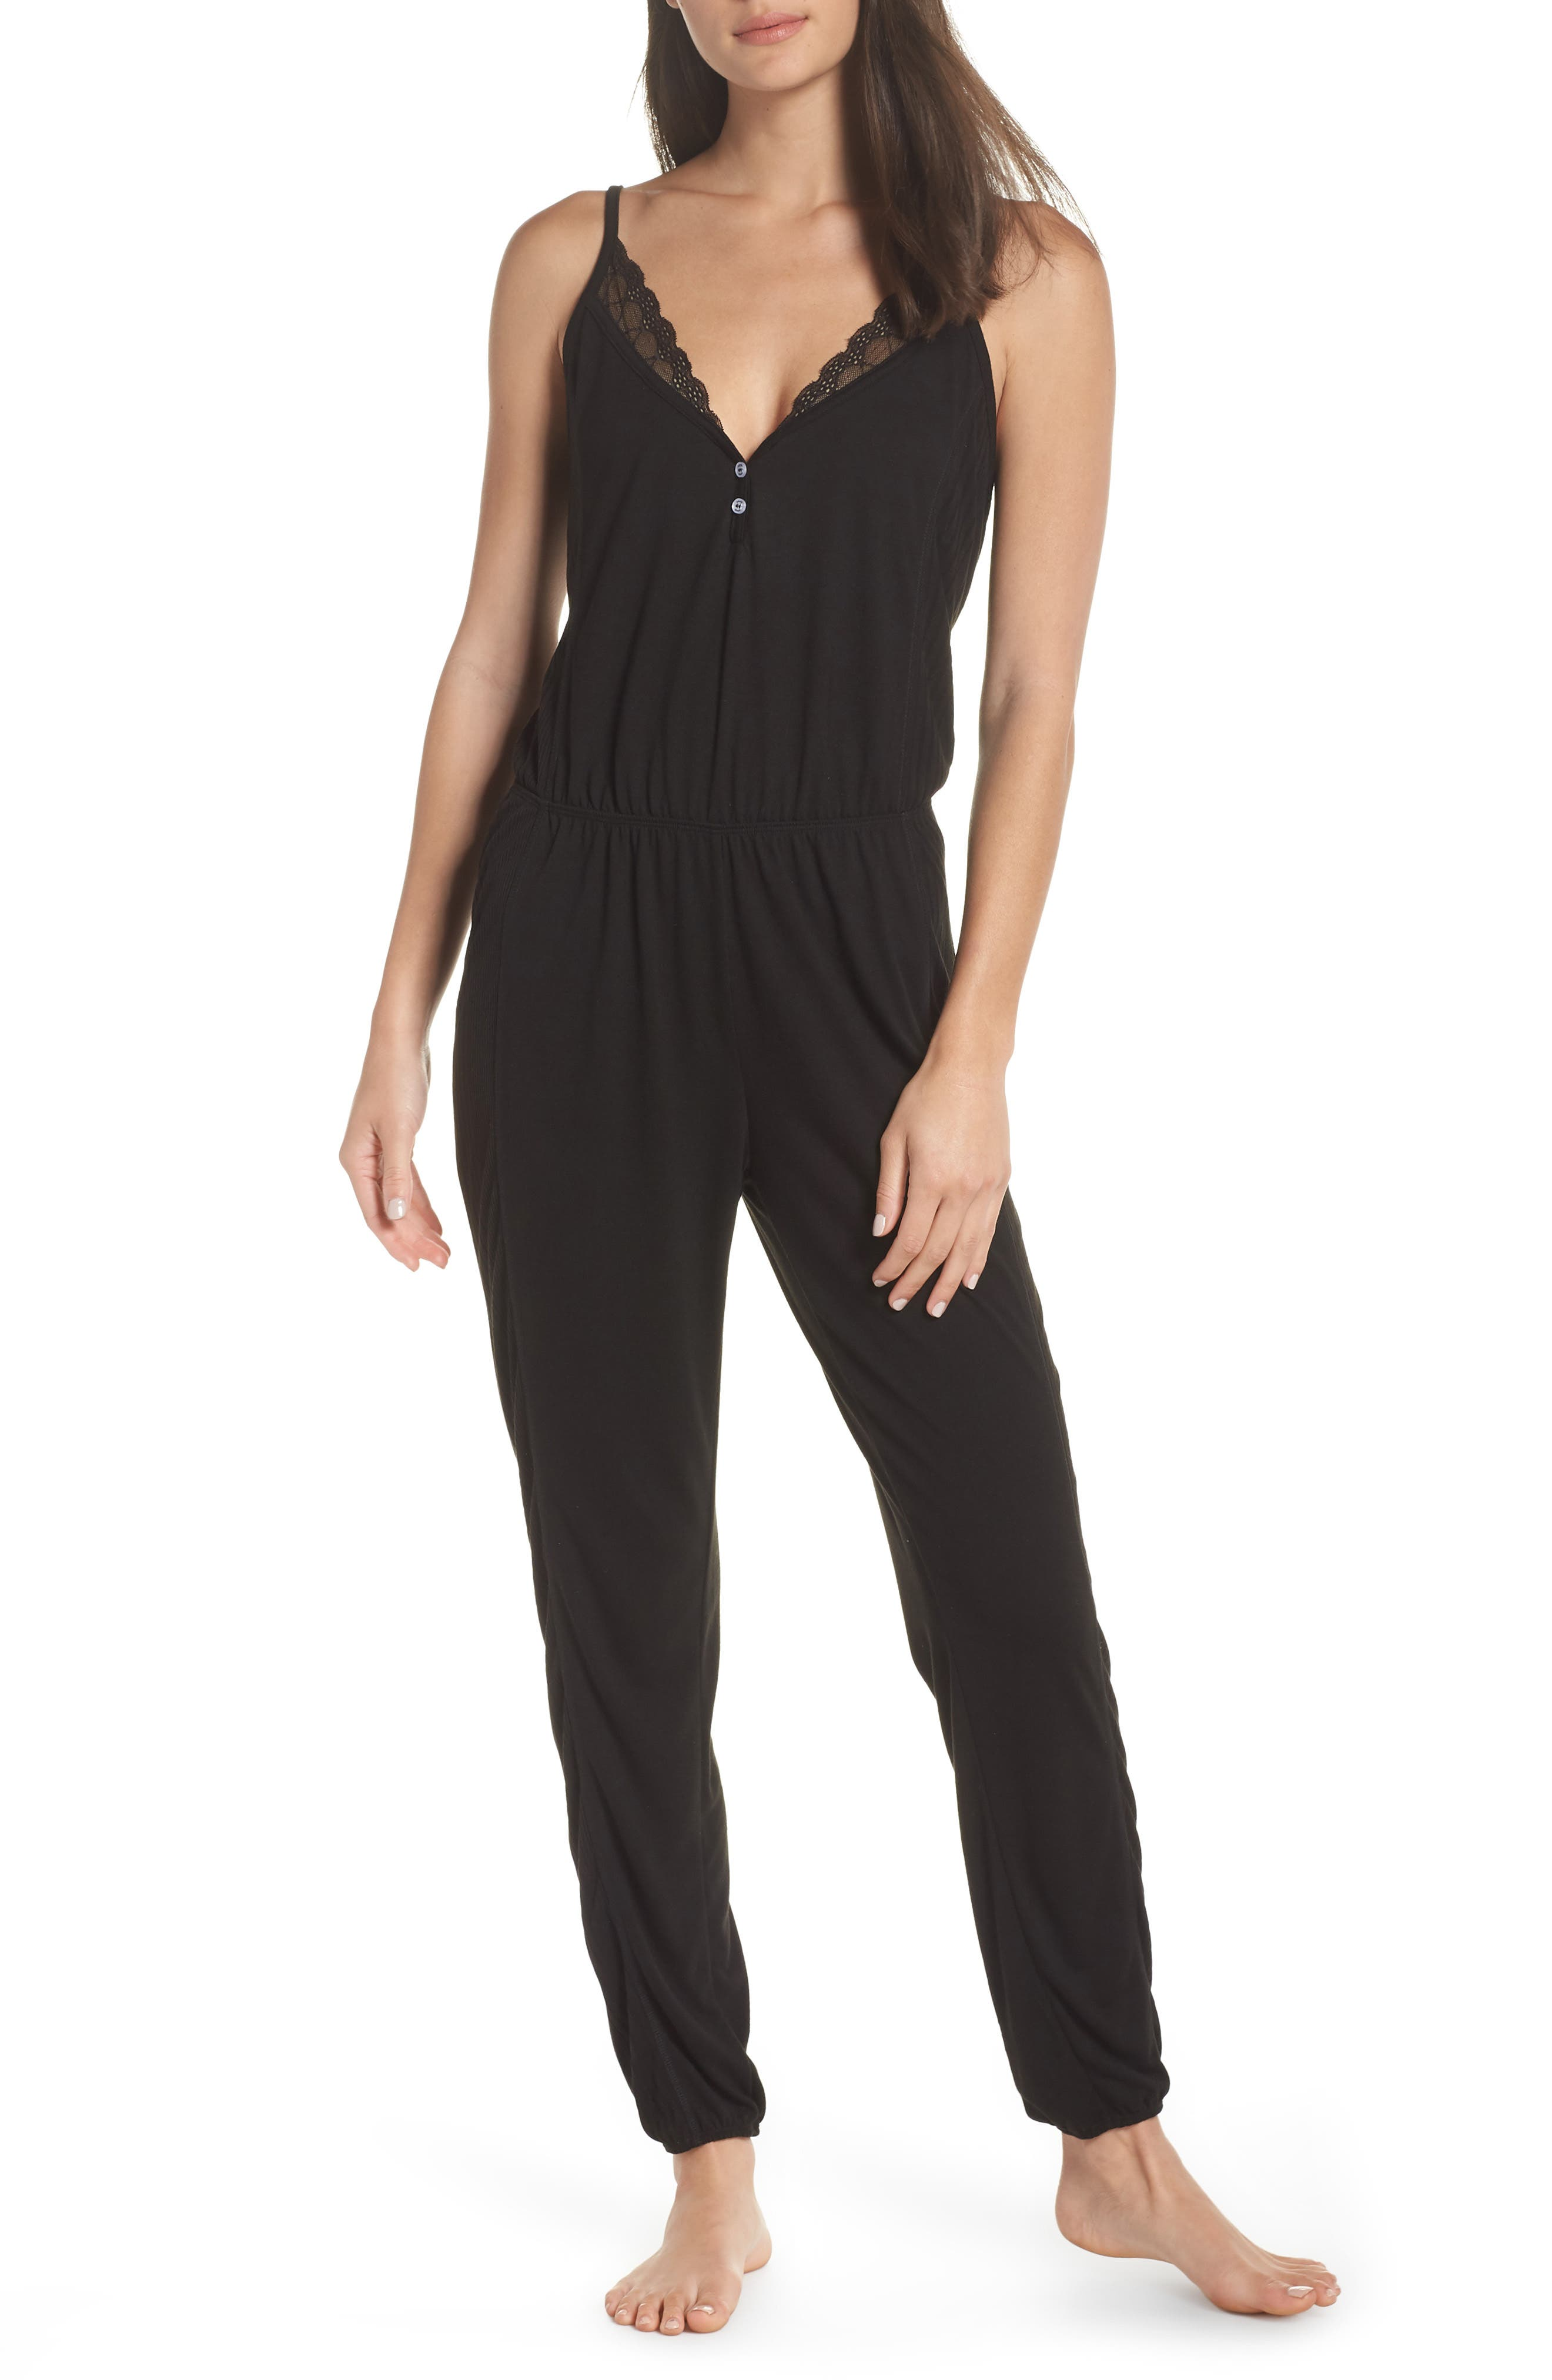 Splendid Romper Pajamas, Black